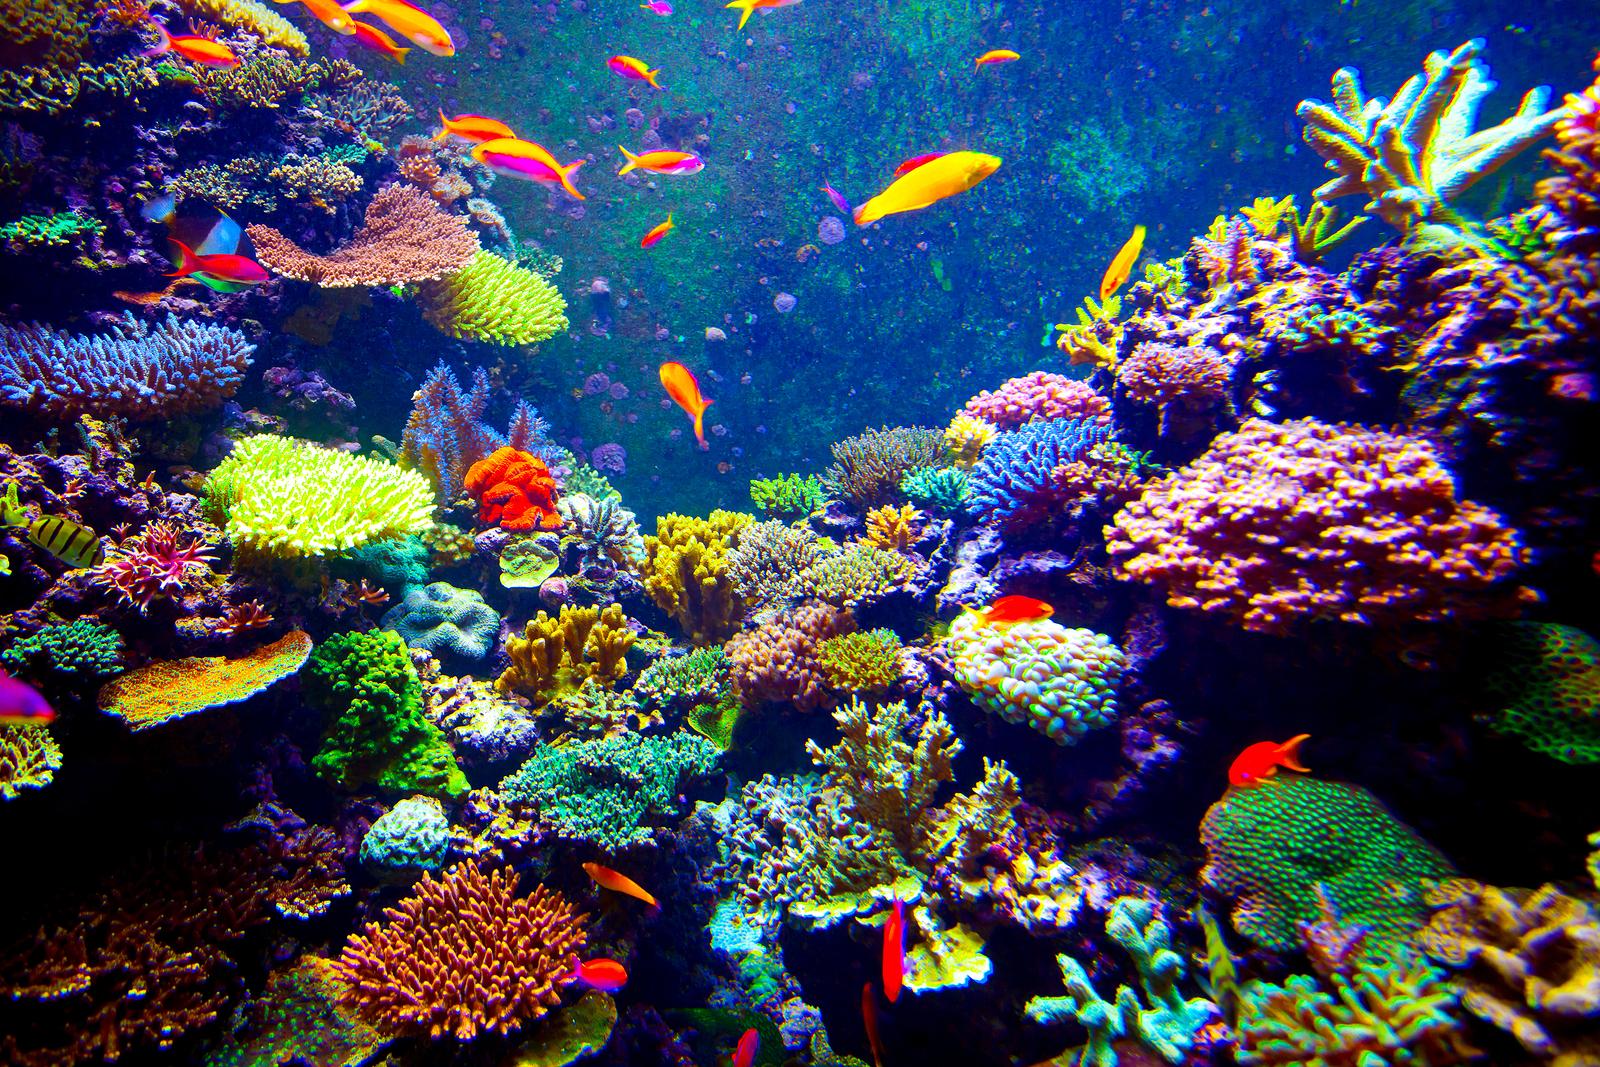 Visit sea creatures near florida homes at the florida aquarium for Florida tropical fish